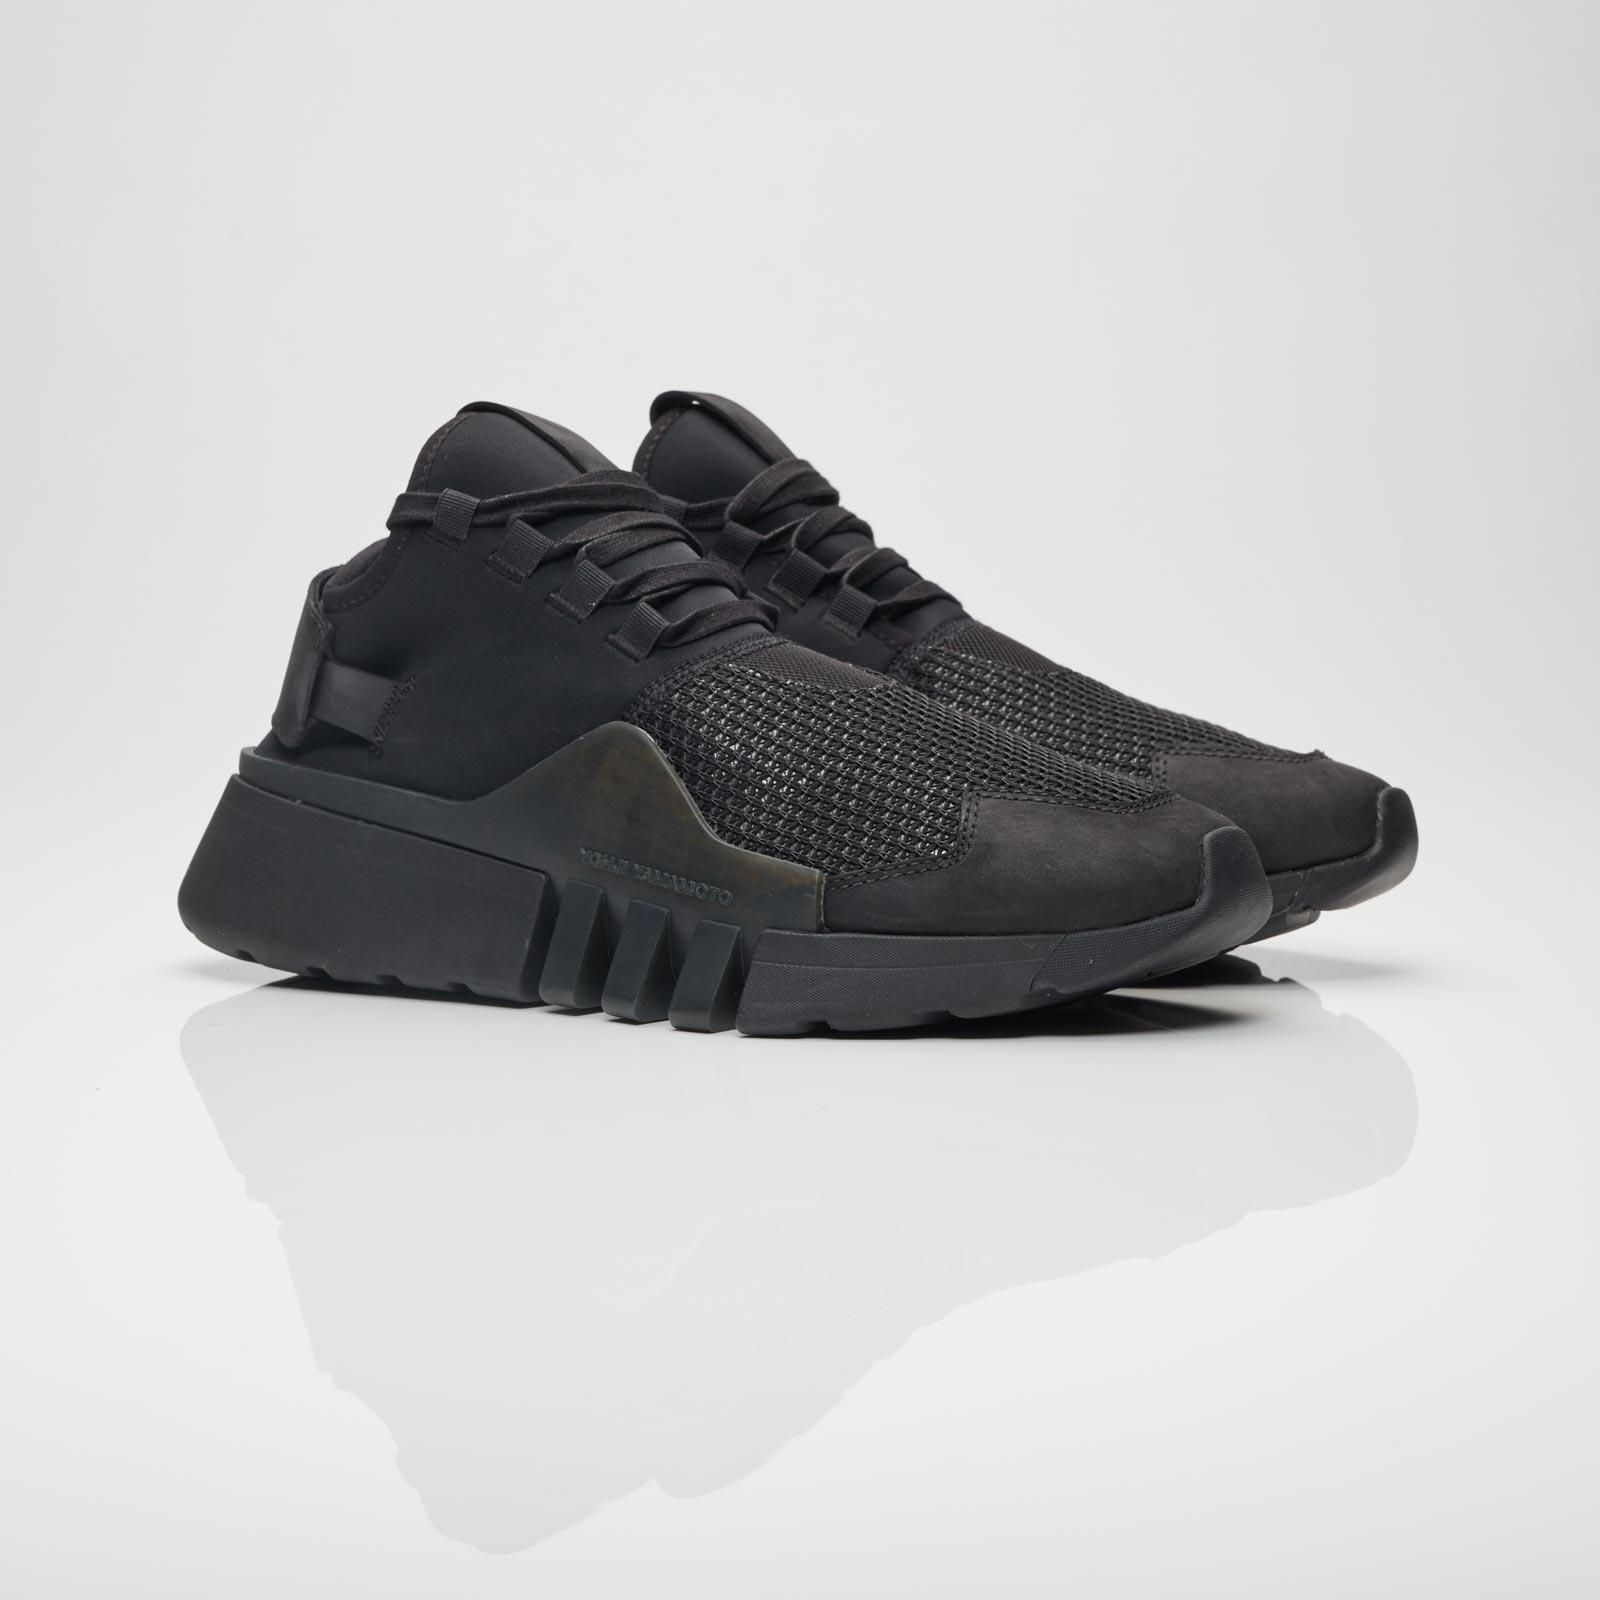 9fb9e6e51ed0b adidas Ayero - Cg3171 - Sneakersnstuff